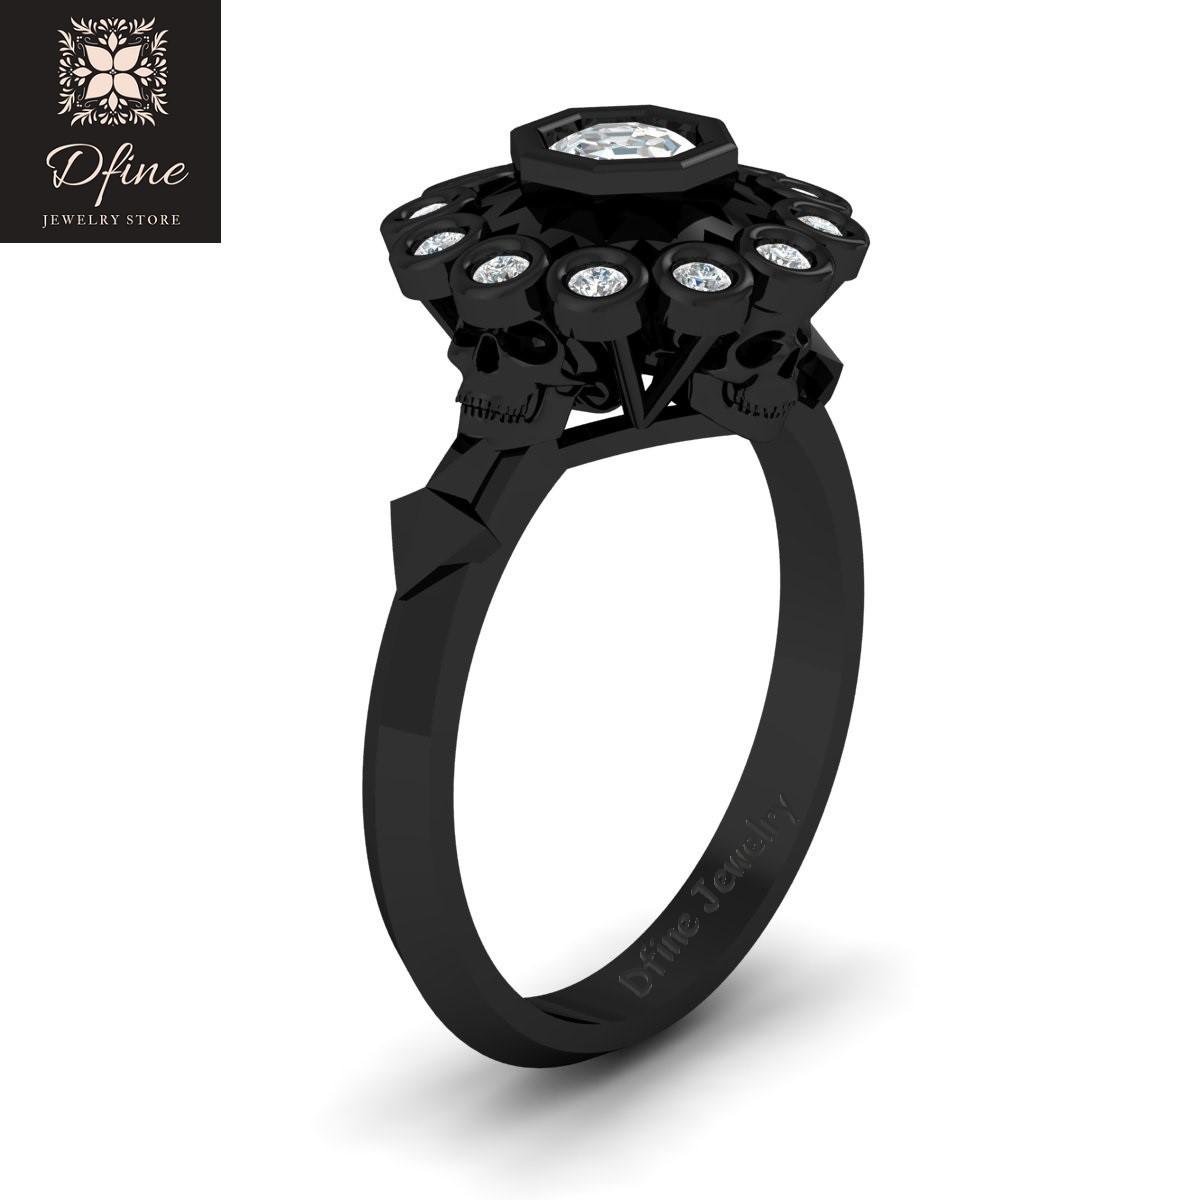 Octagon Diamond Ring Witchy Geeky Vapor Gloomy Mortal